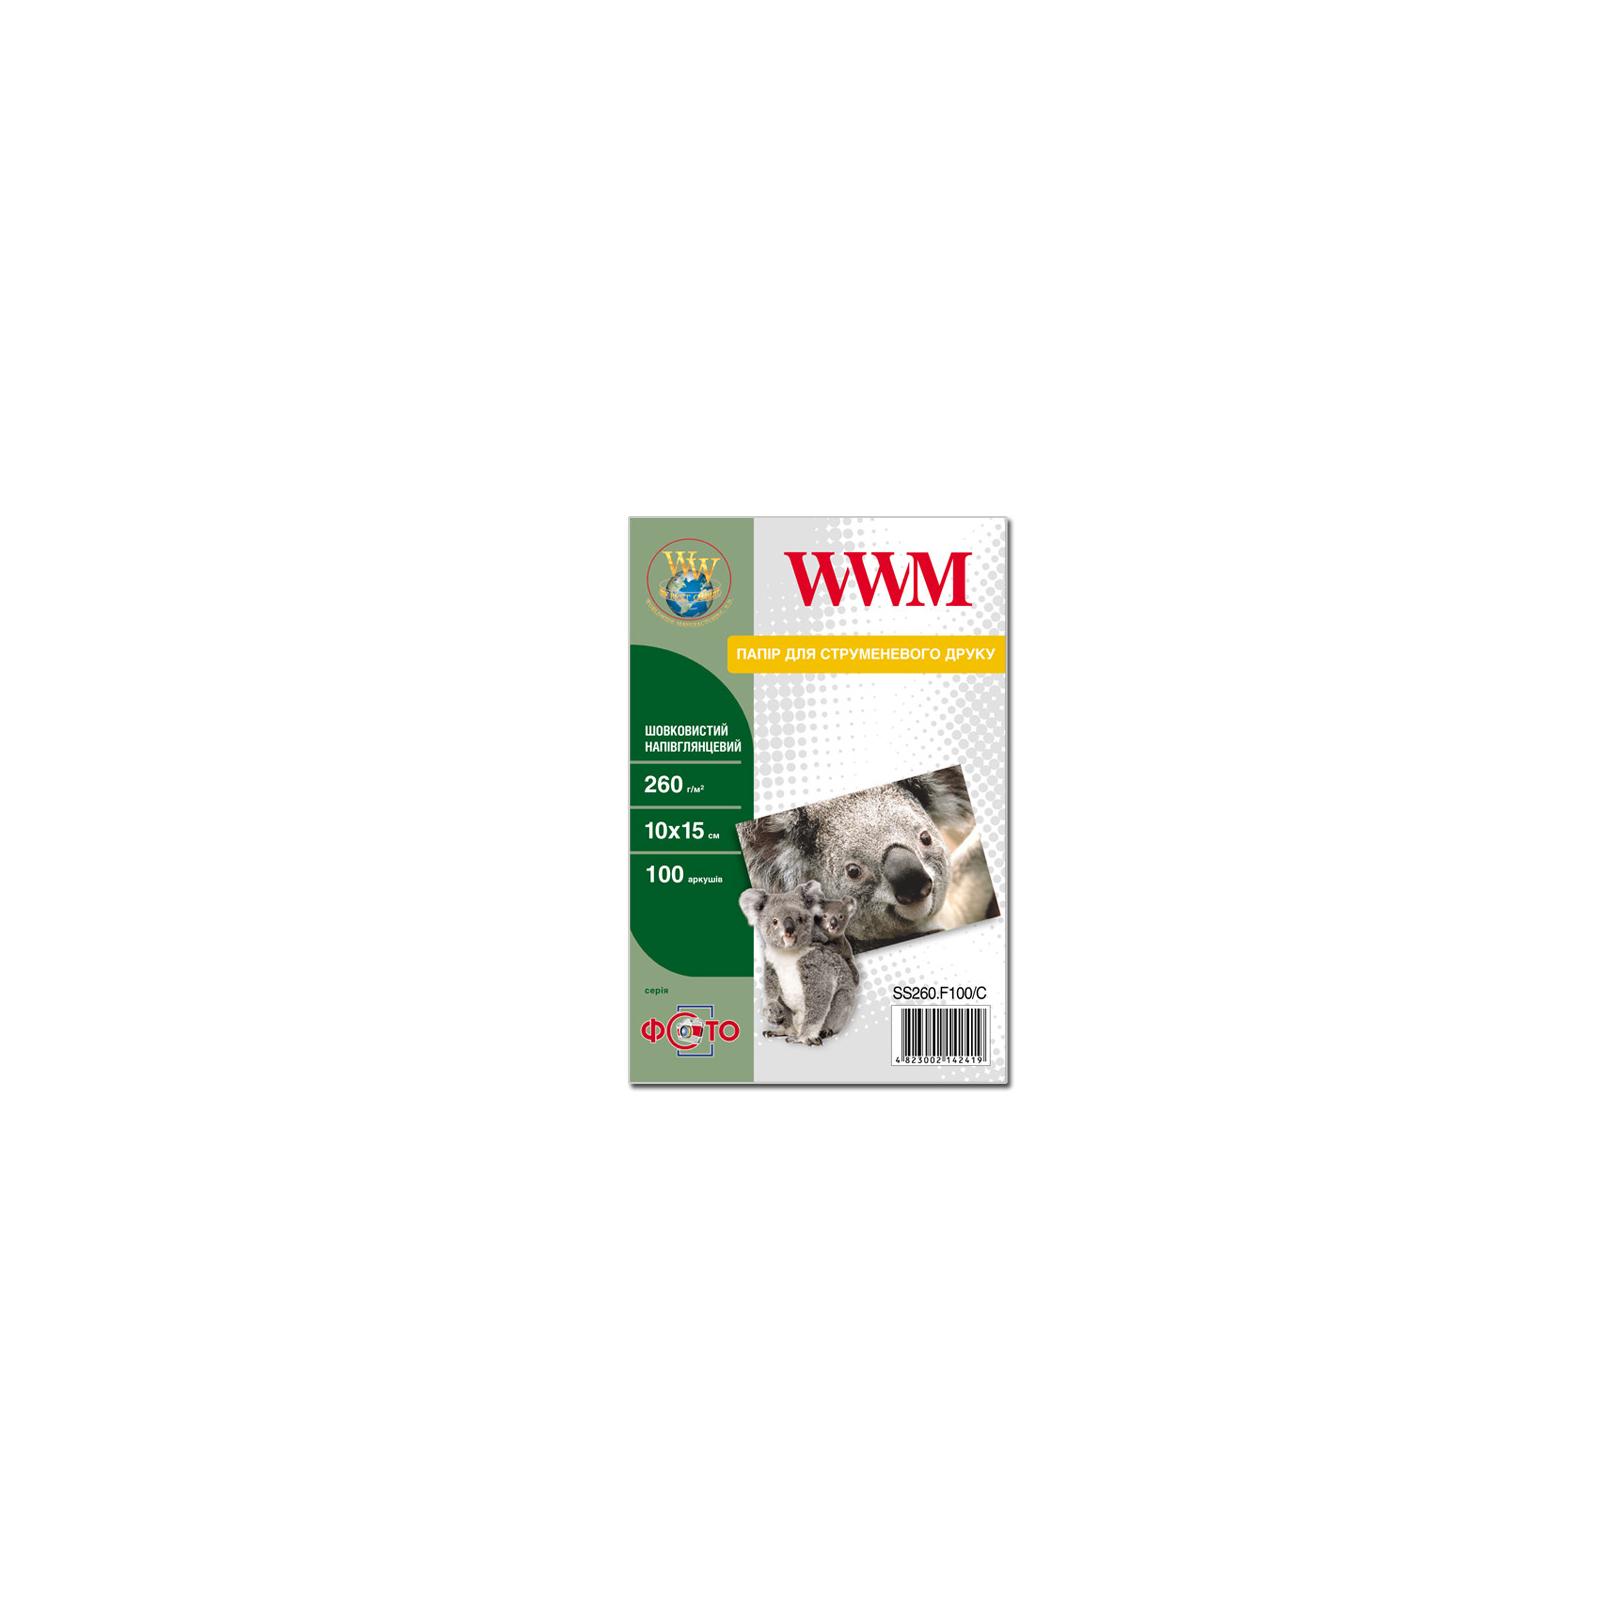 Бумага WWM 10x15 (SS260.F100/C)